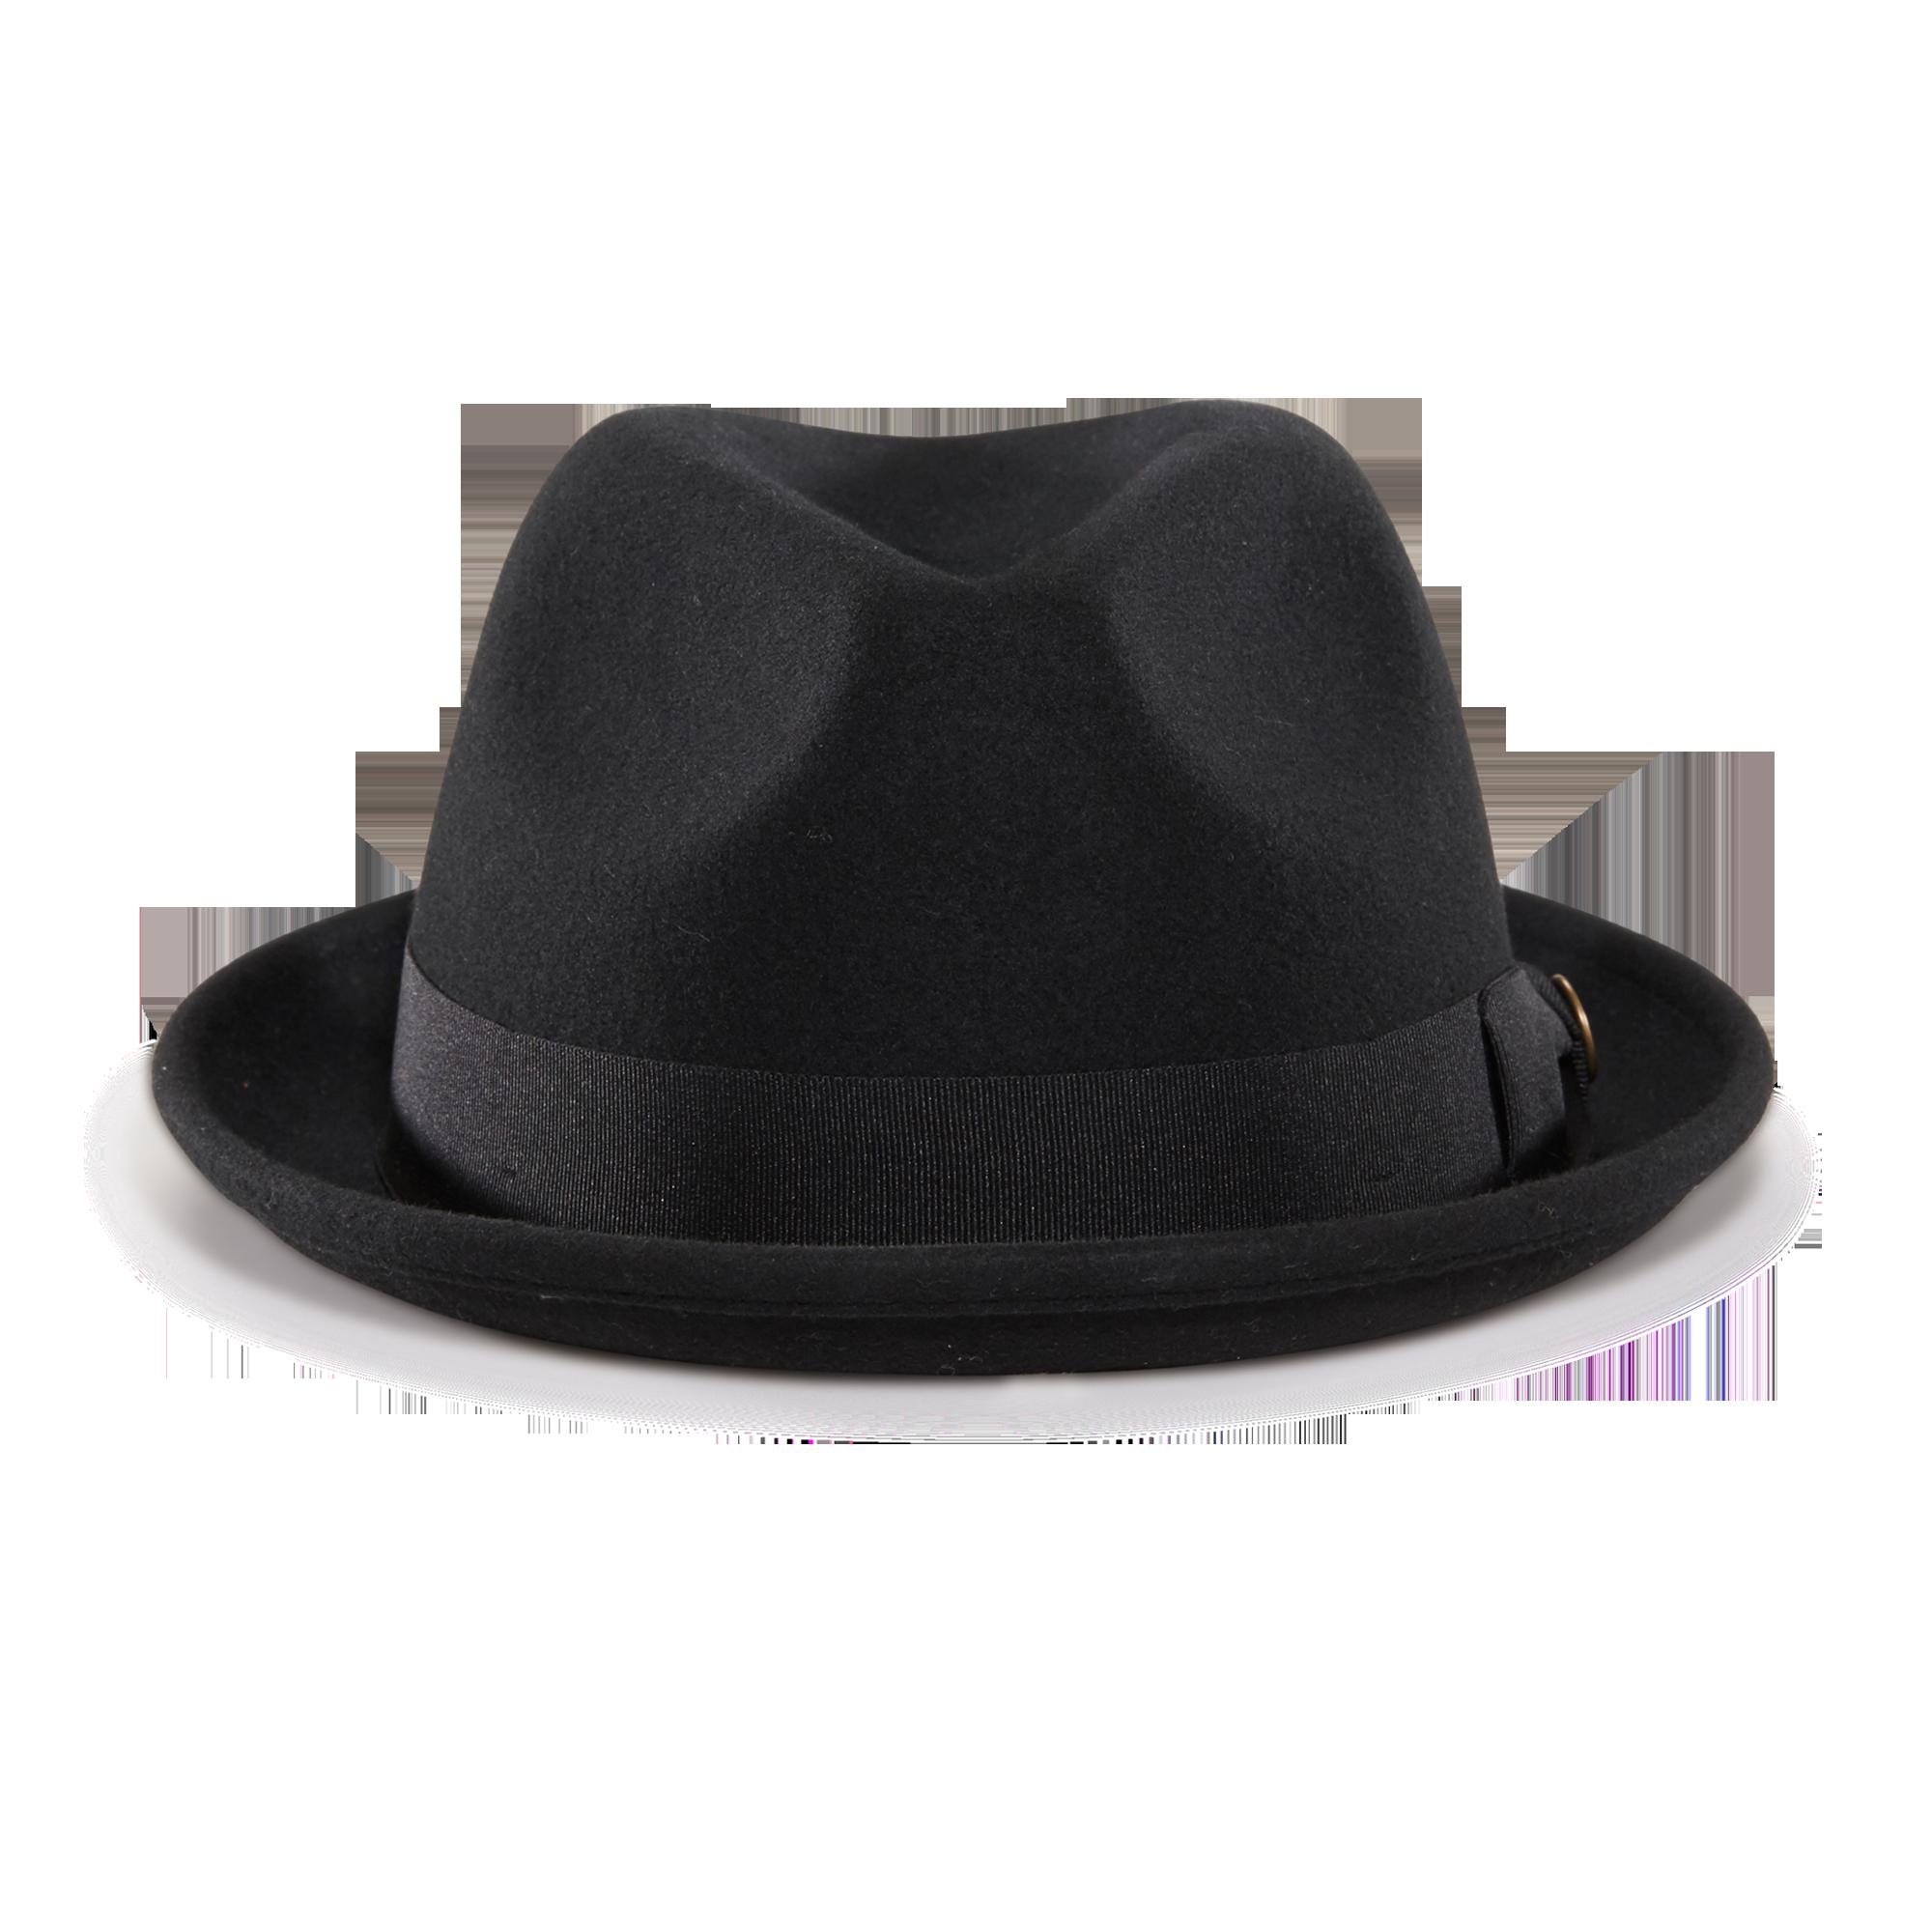 Good Boy - B2C Catalog - Boy With Hat PNG